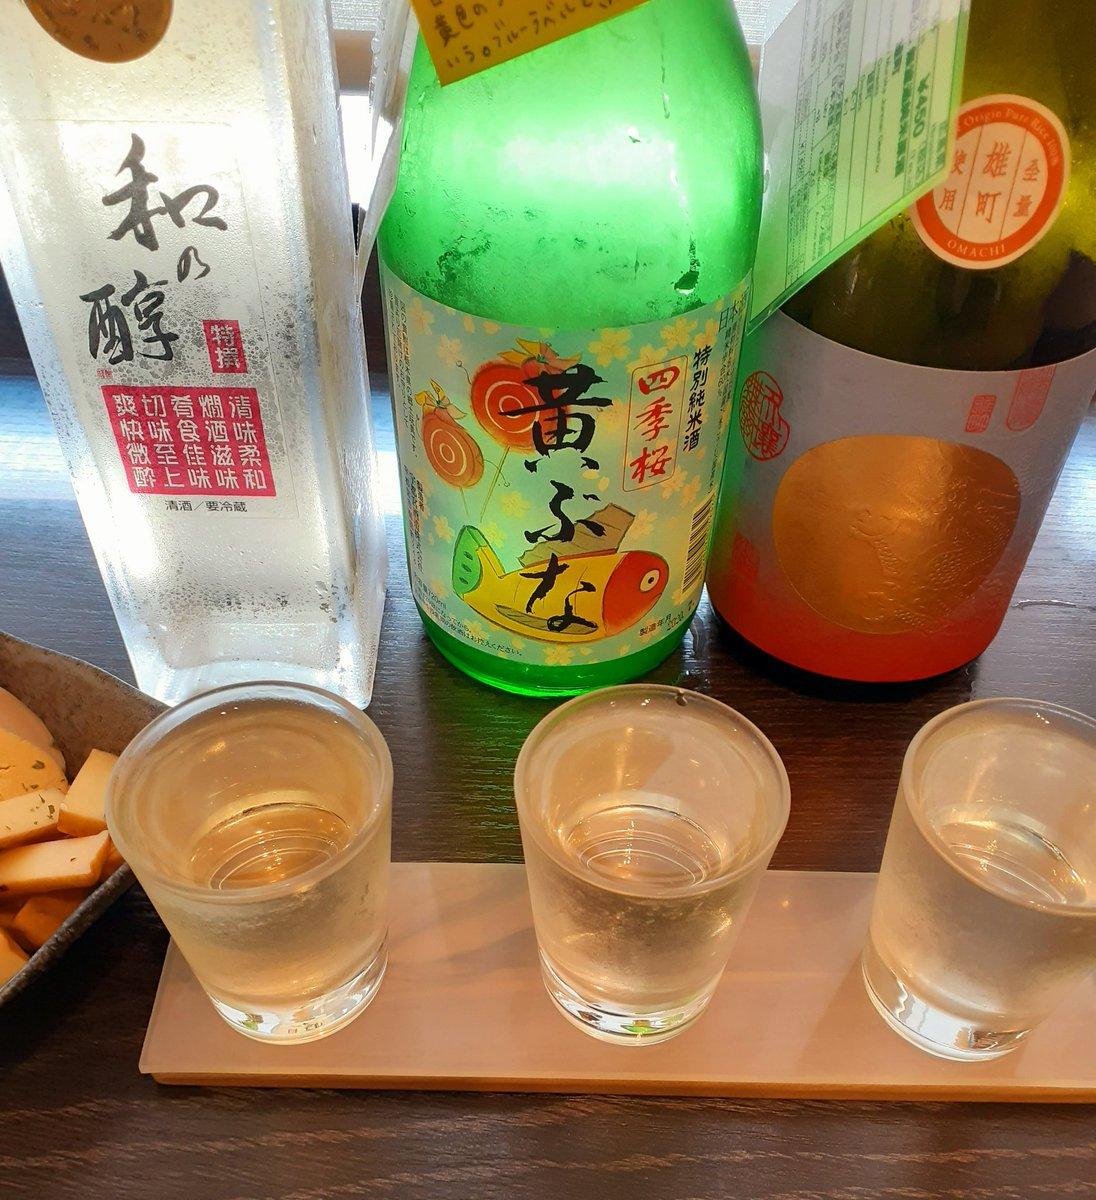 test ツイッターメディア - お茶の水の名酒センターさん @meishu_center  湯島聖堂と神田明神に挟まれた立地が凄い🌟 色々な日本酒とおつまみが楽しい。 持ち帰りにアマビエ様ラベルの出羽桜と帰りに寄った神田明神の御神酒。 https://t.co/dlwVCP50j3